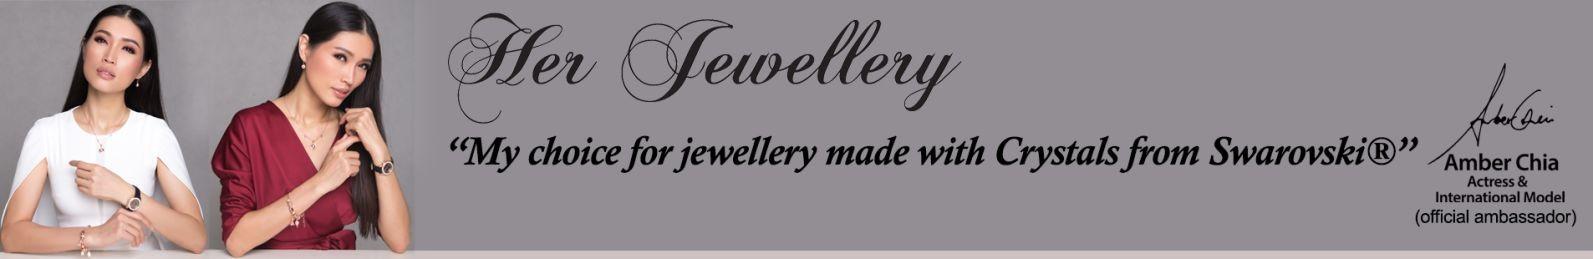 Her Jewellery